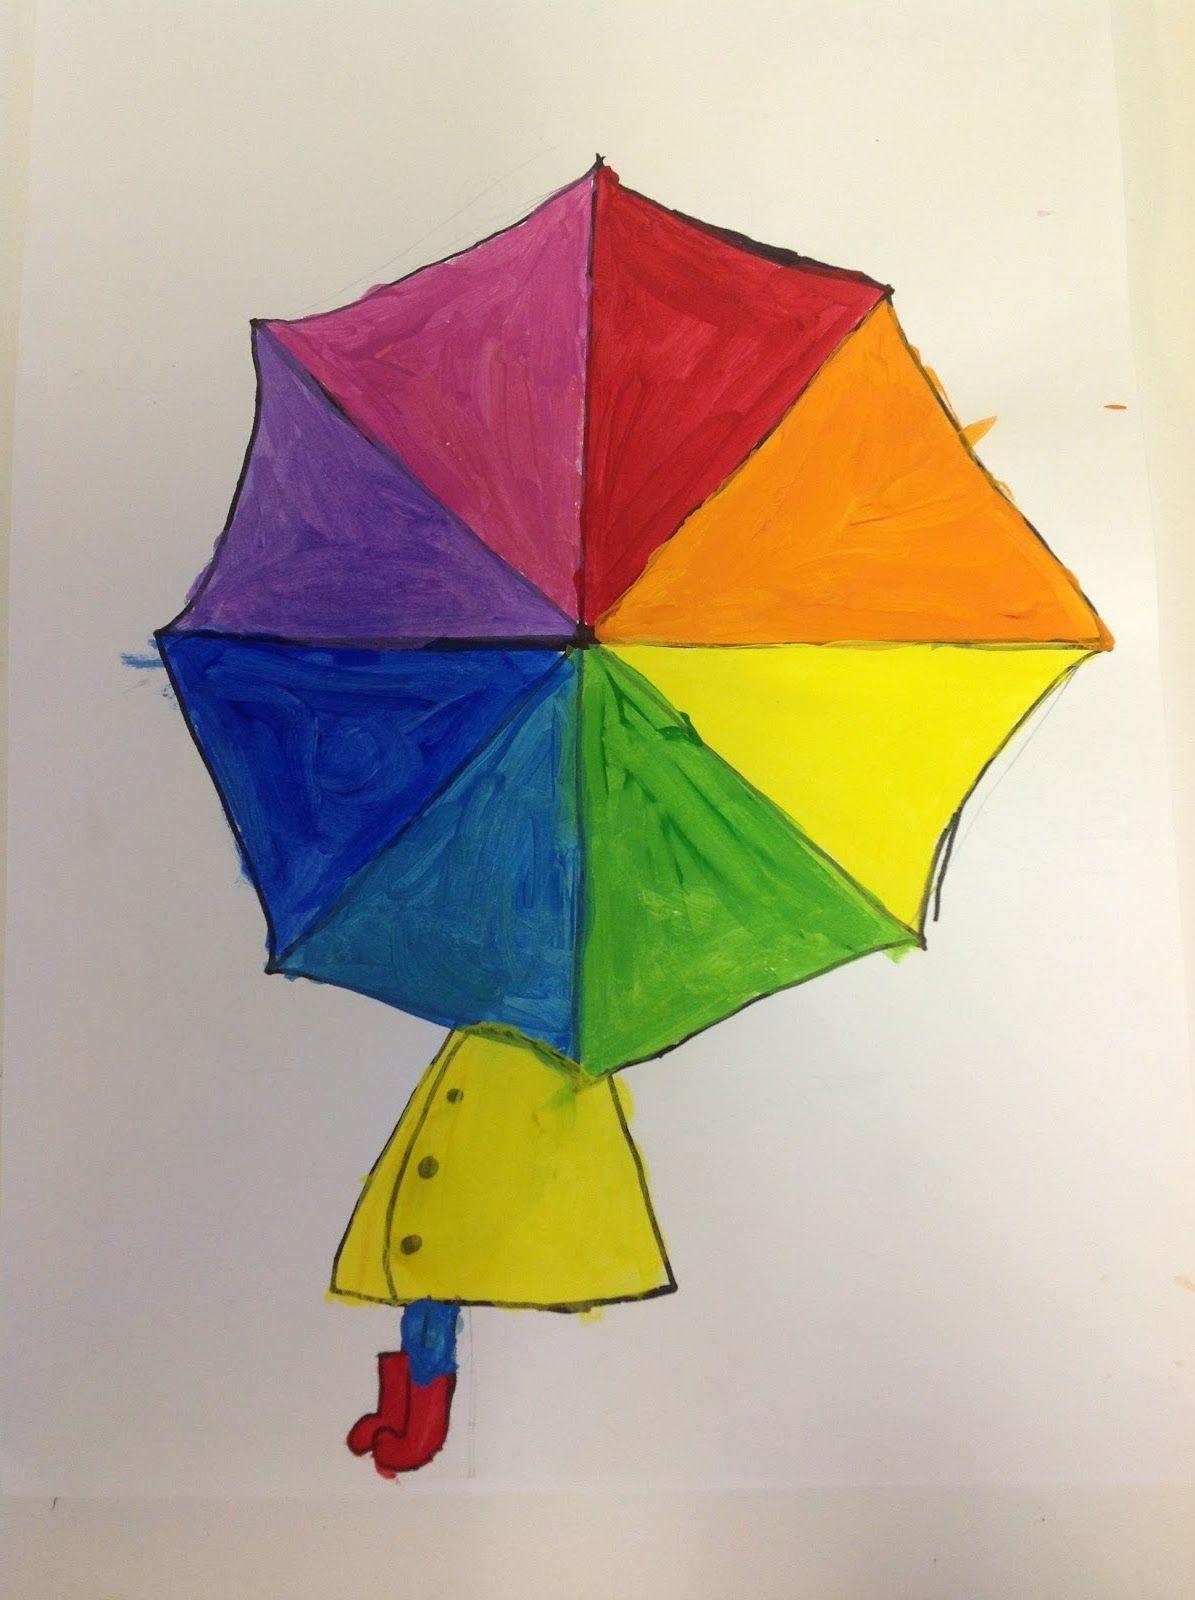 Color wheel art lesson for second grade - Color Wheel Umbrellas Grade K 2 For Kindergarten Could Just Draw The Umbrella